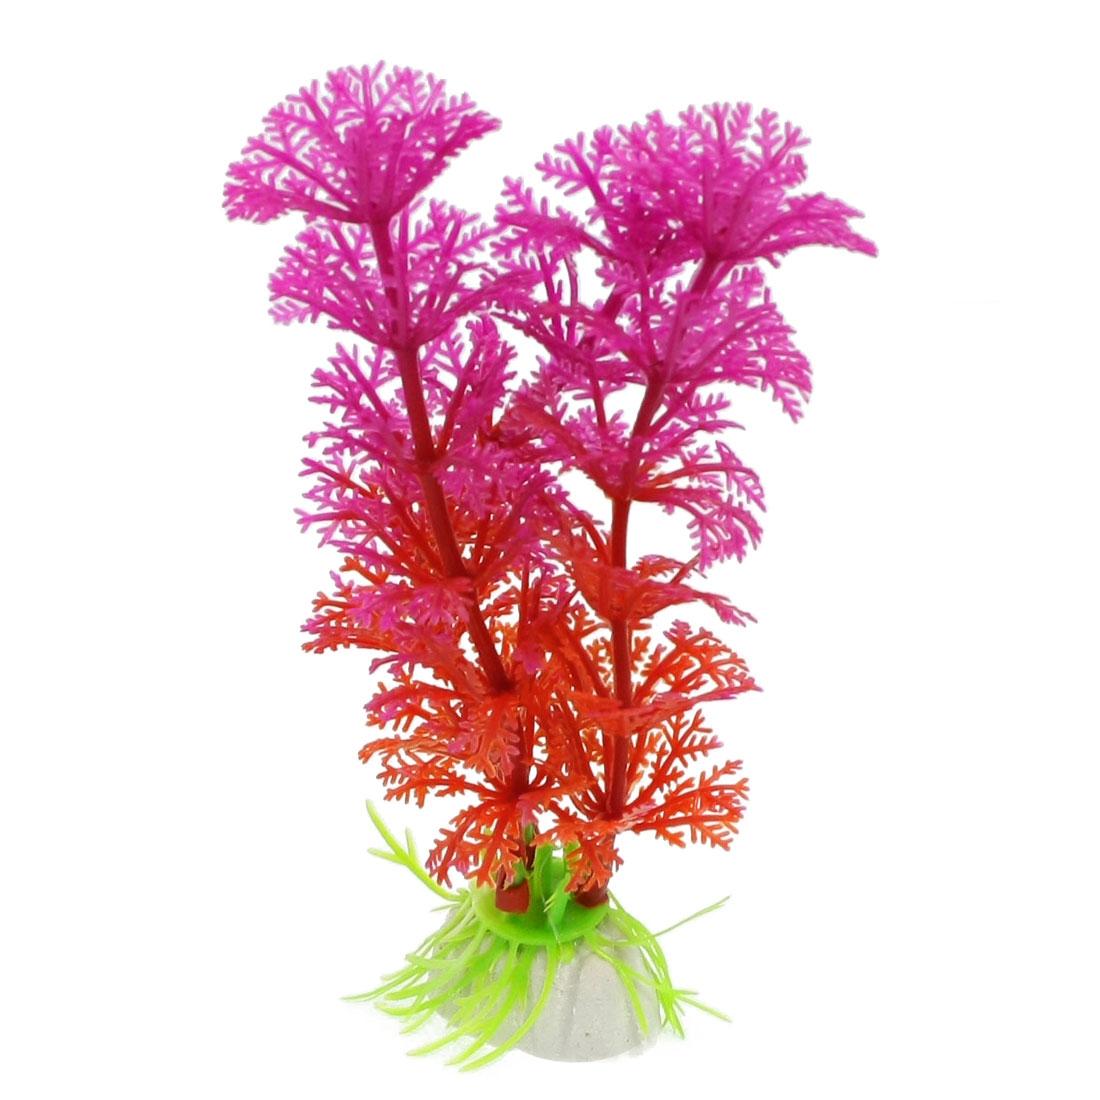 "4.7"" Height Fish Tank Plastic Fuchsia Red Artificial Plants Ornament 2 Pcs"